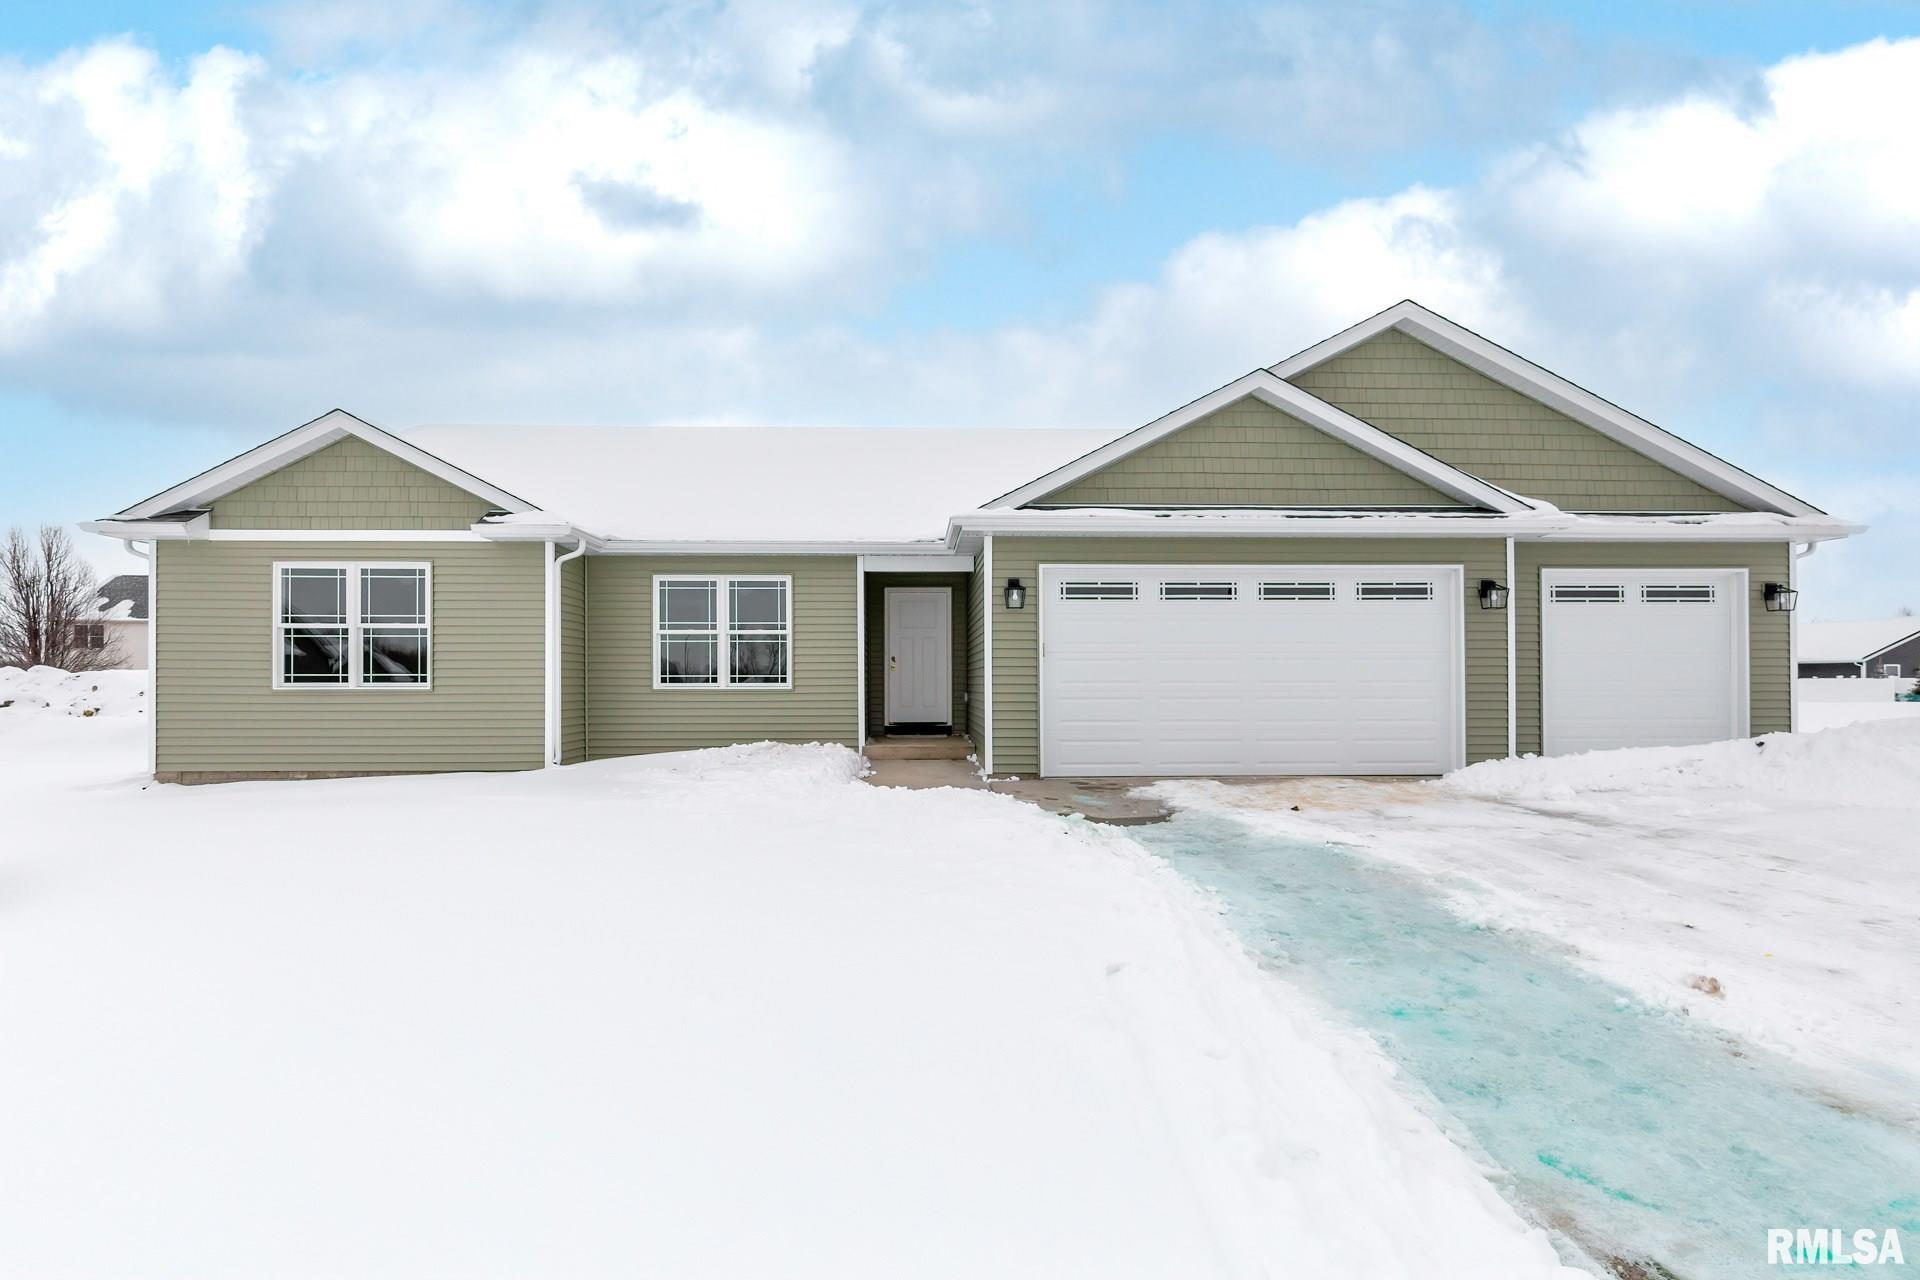 4704 W 12TH Property Photo - Davenport, IA real estate listing